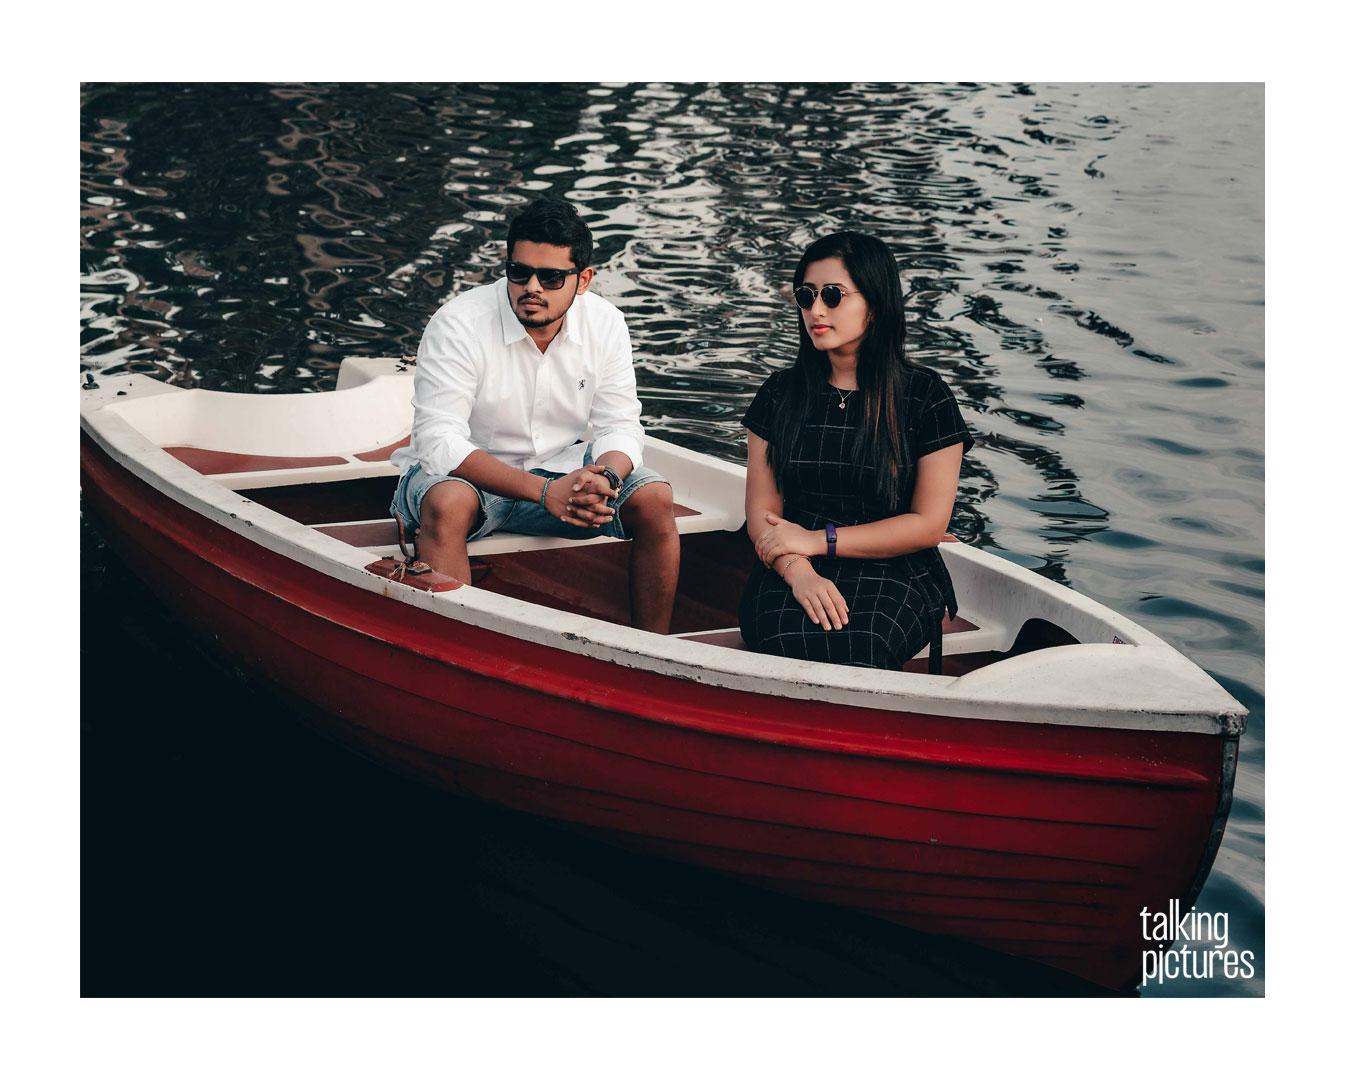 Boat Couple